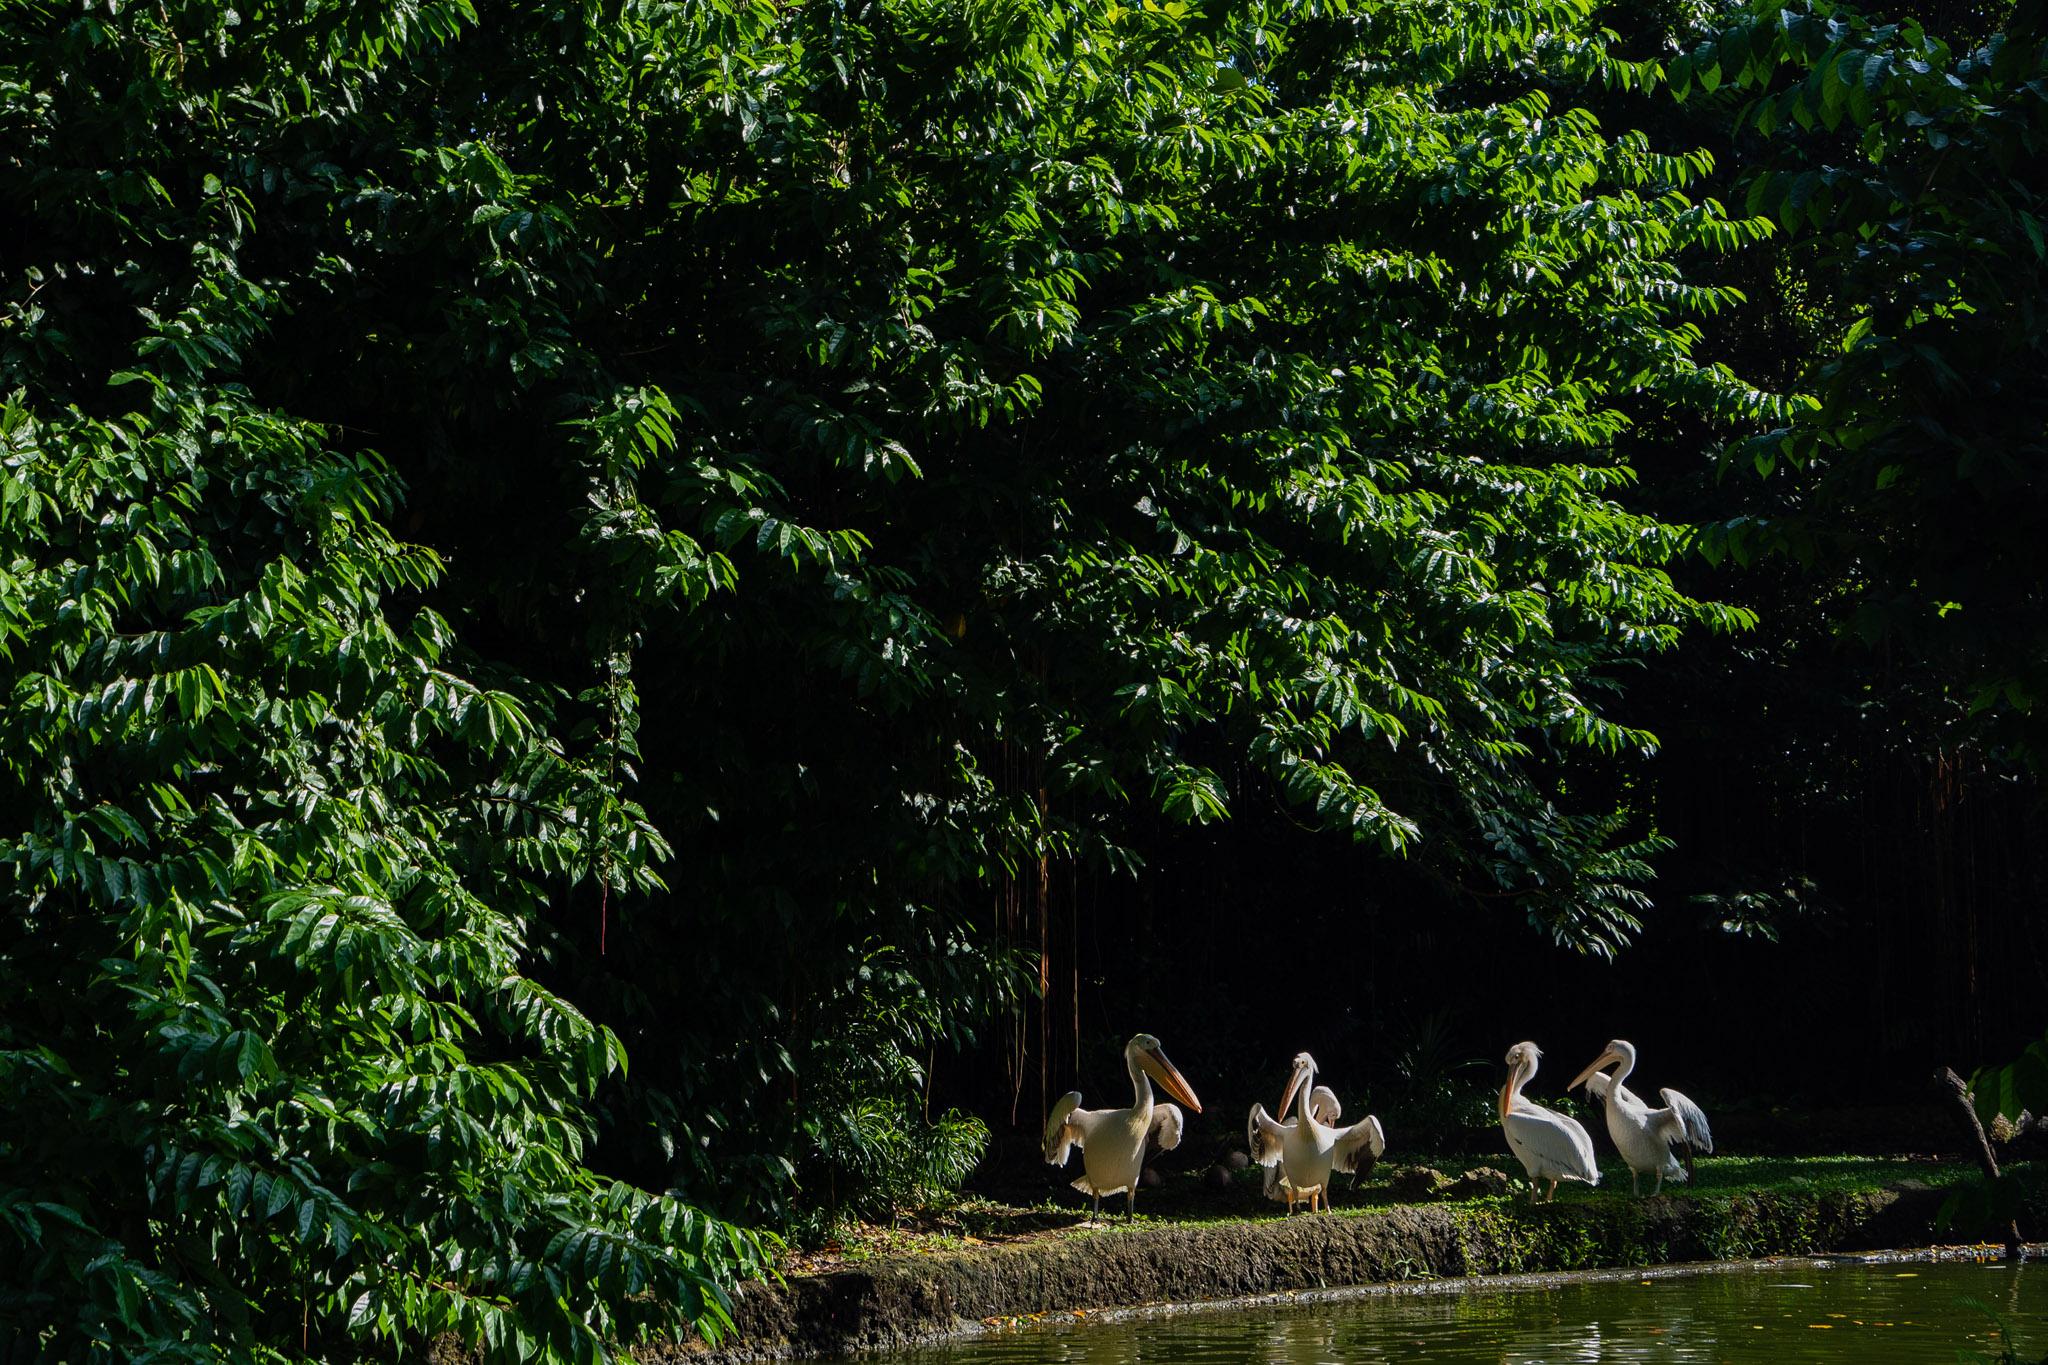 viator-singapore-photographer-tourism-tours-zoo-little-india-gardens-marina-bay-007.jpg